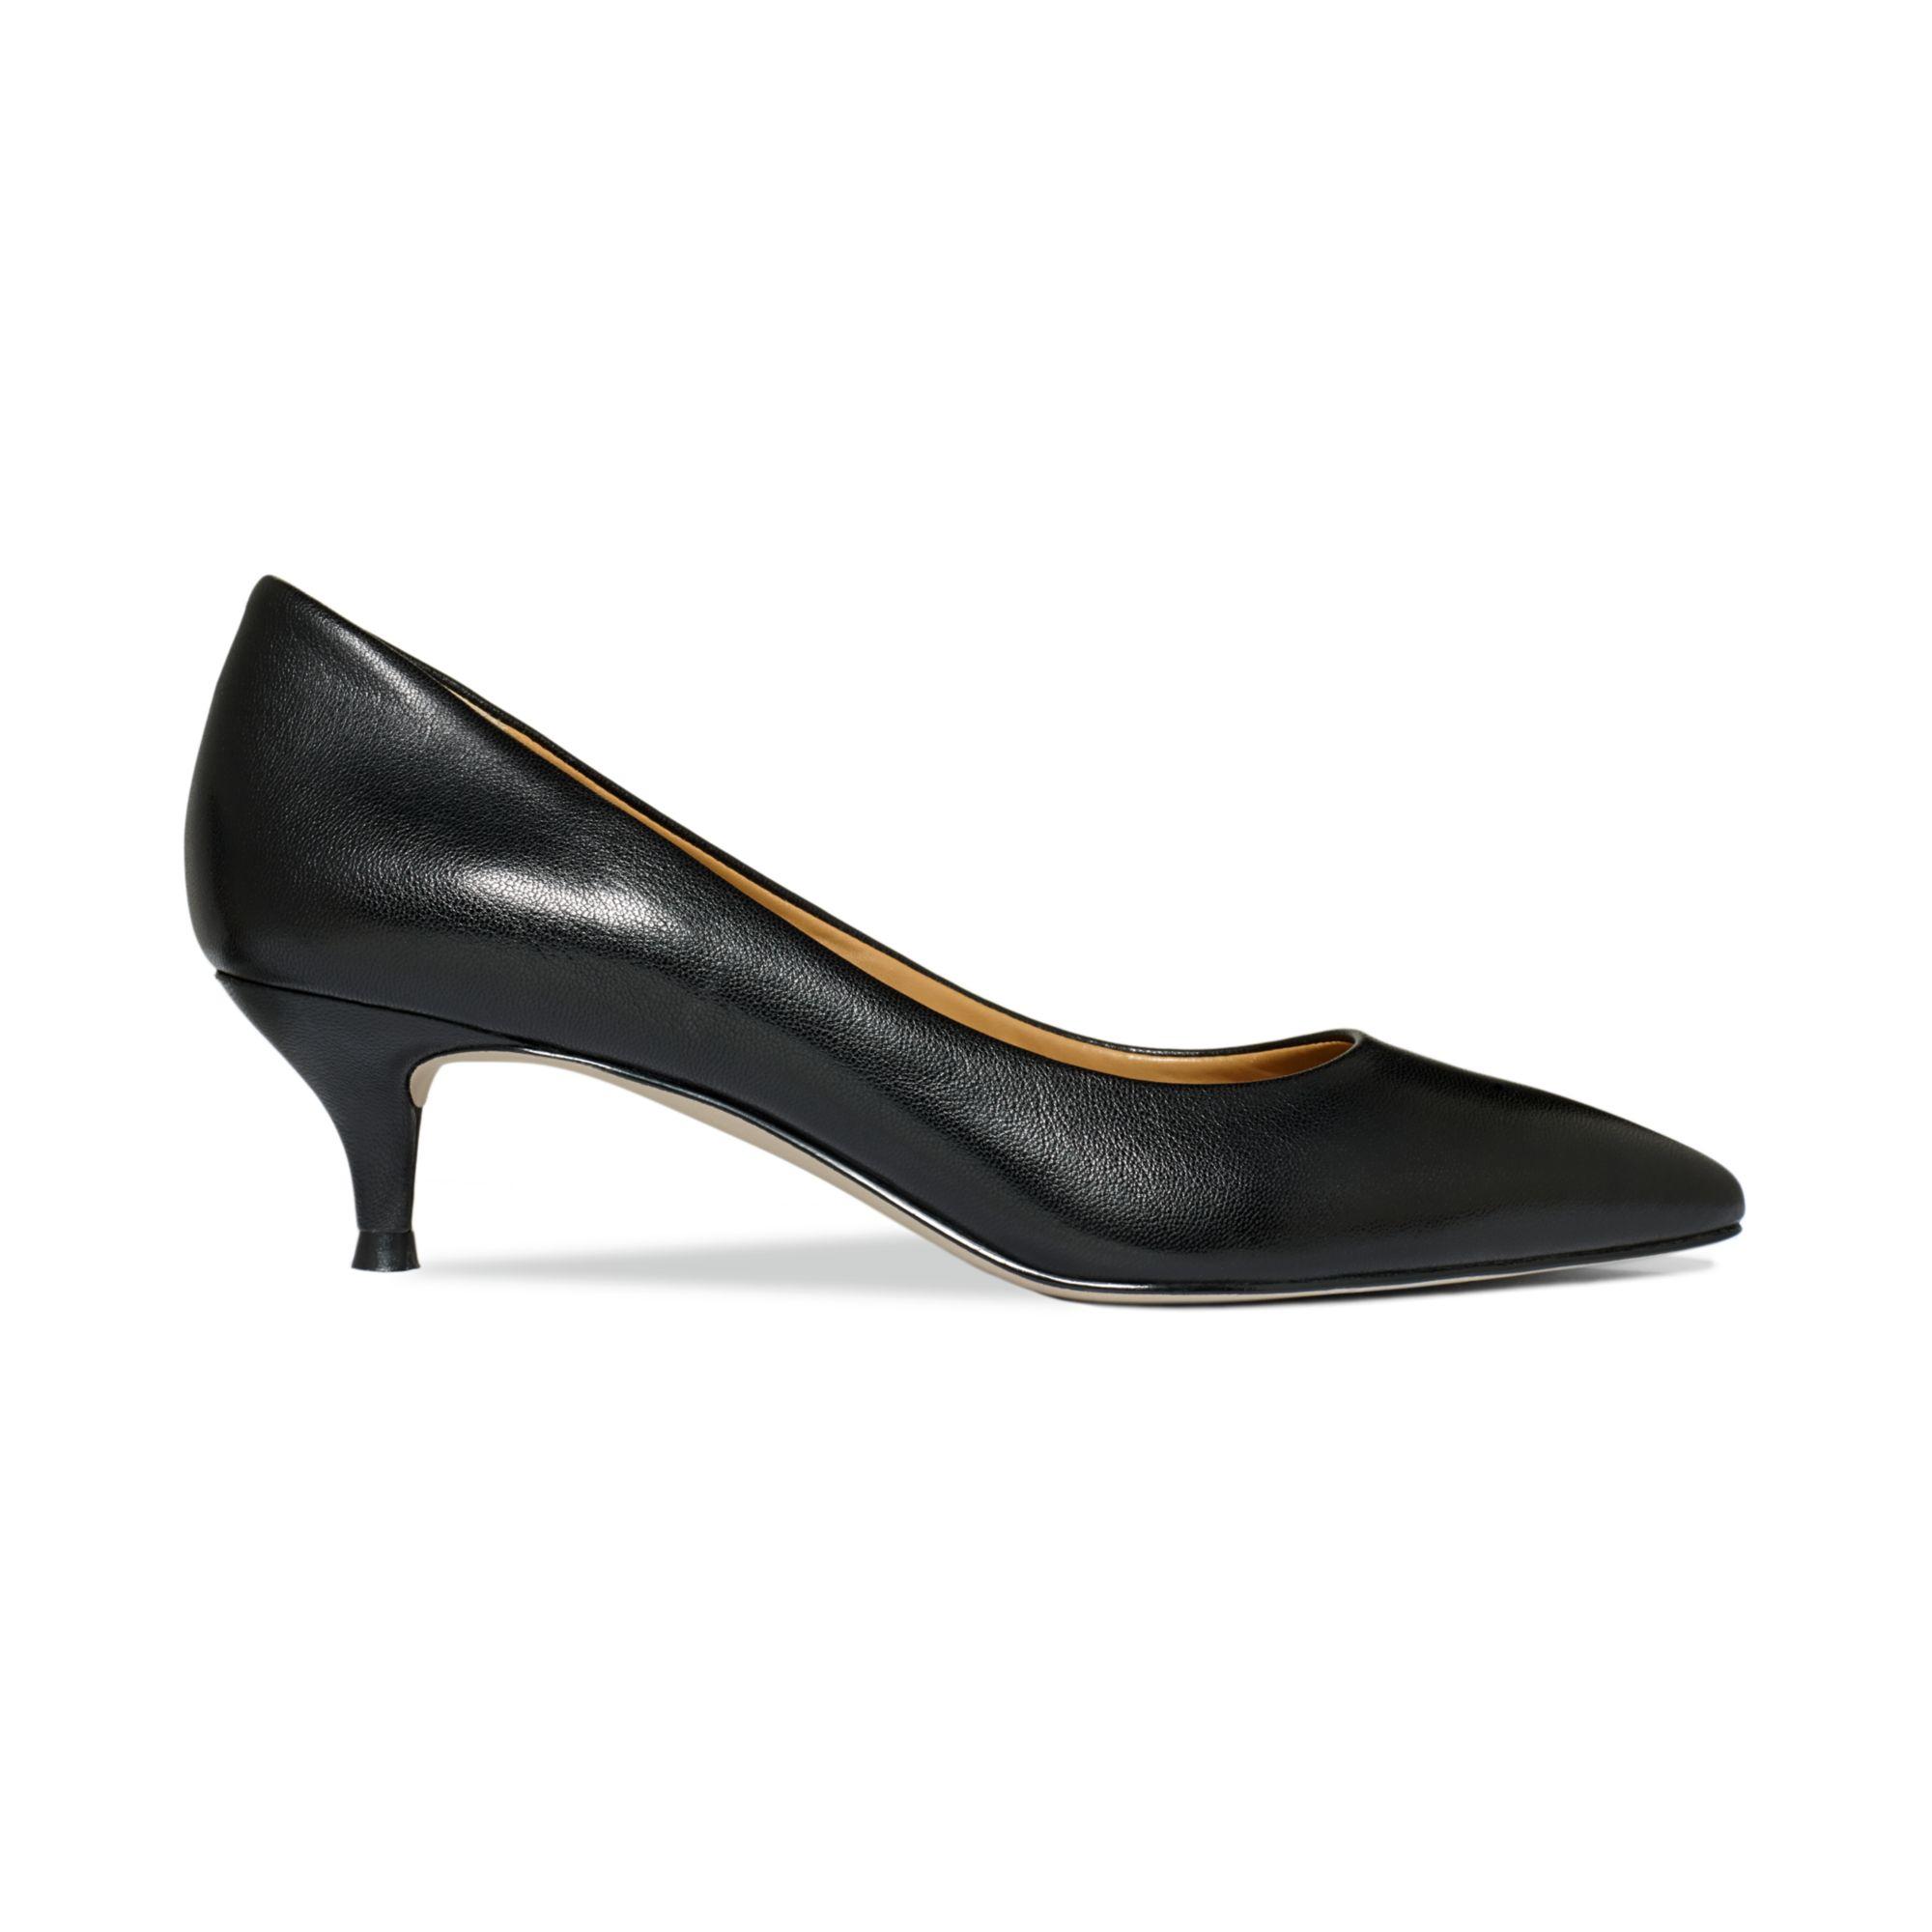 2eeeb50ad20 Lyst - Nine West Illumie Kitten Heel Pumps in Black